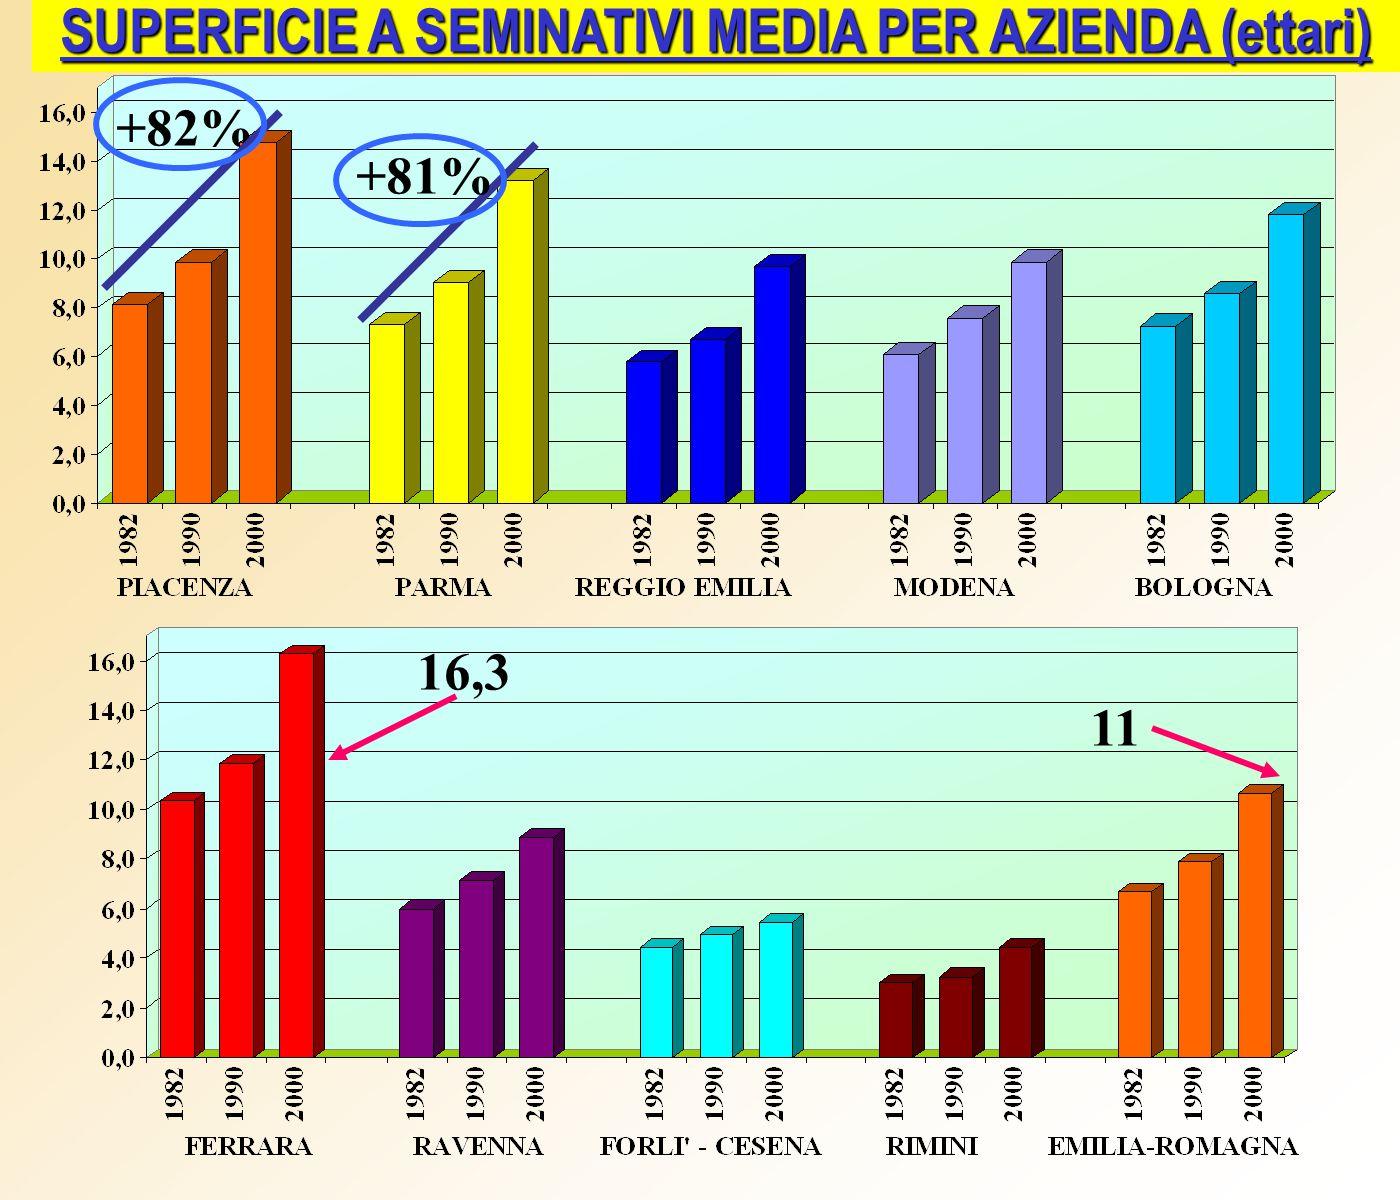 SUPERFICIE A SEMINATIVI MEDIA PER AZIENDA (ettari) +82% +81% 16,3 11